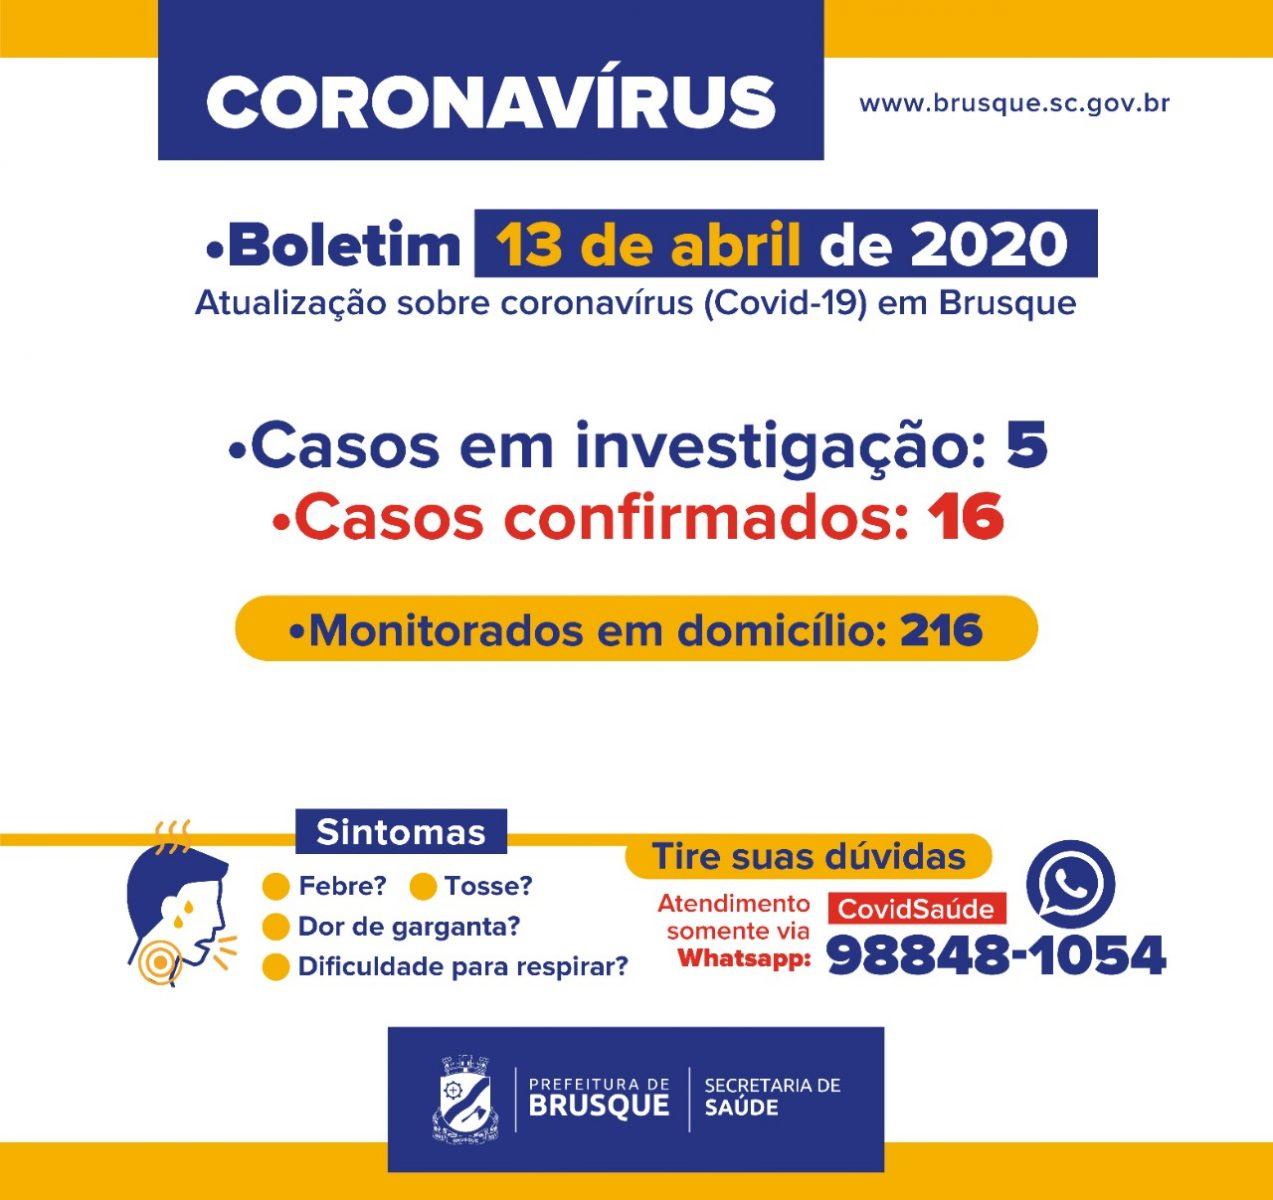 Brusque continua com 16 casos confirmados de coronavírus (Covid-19)